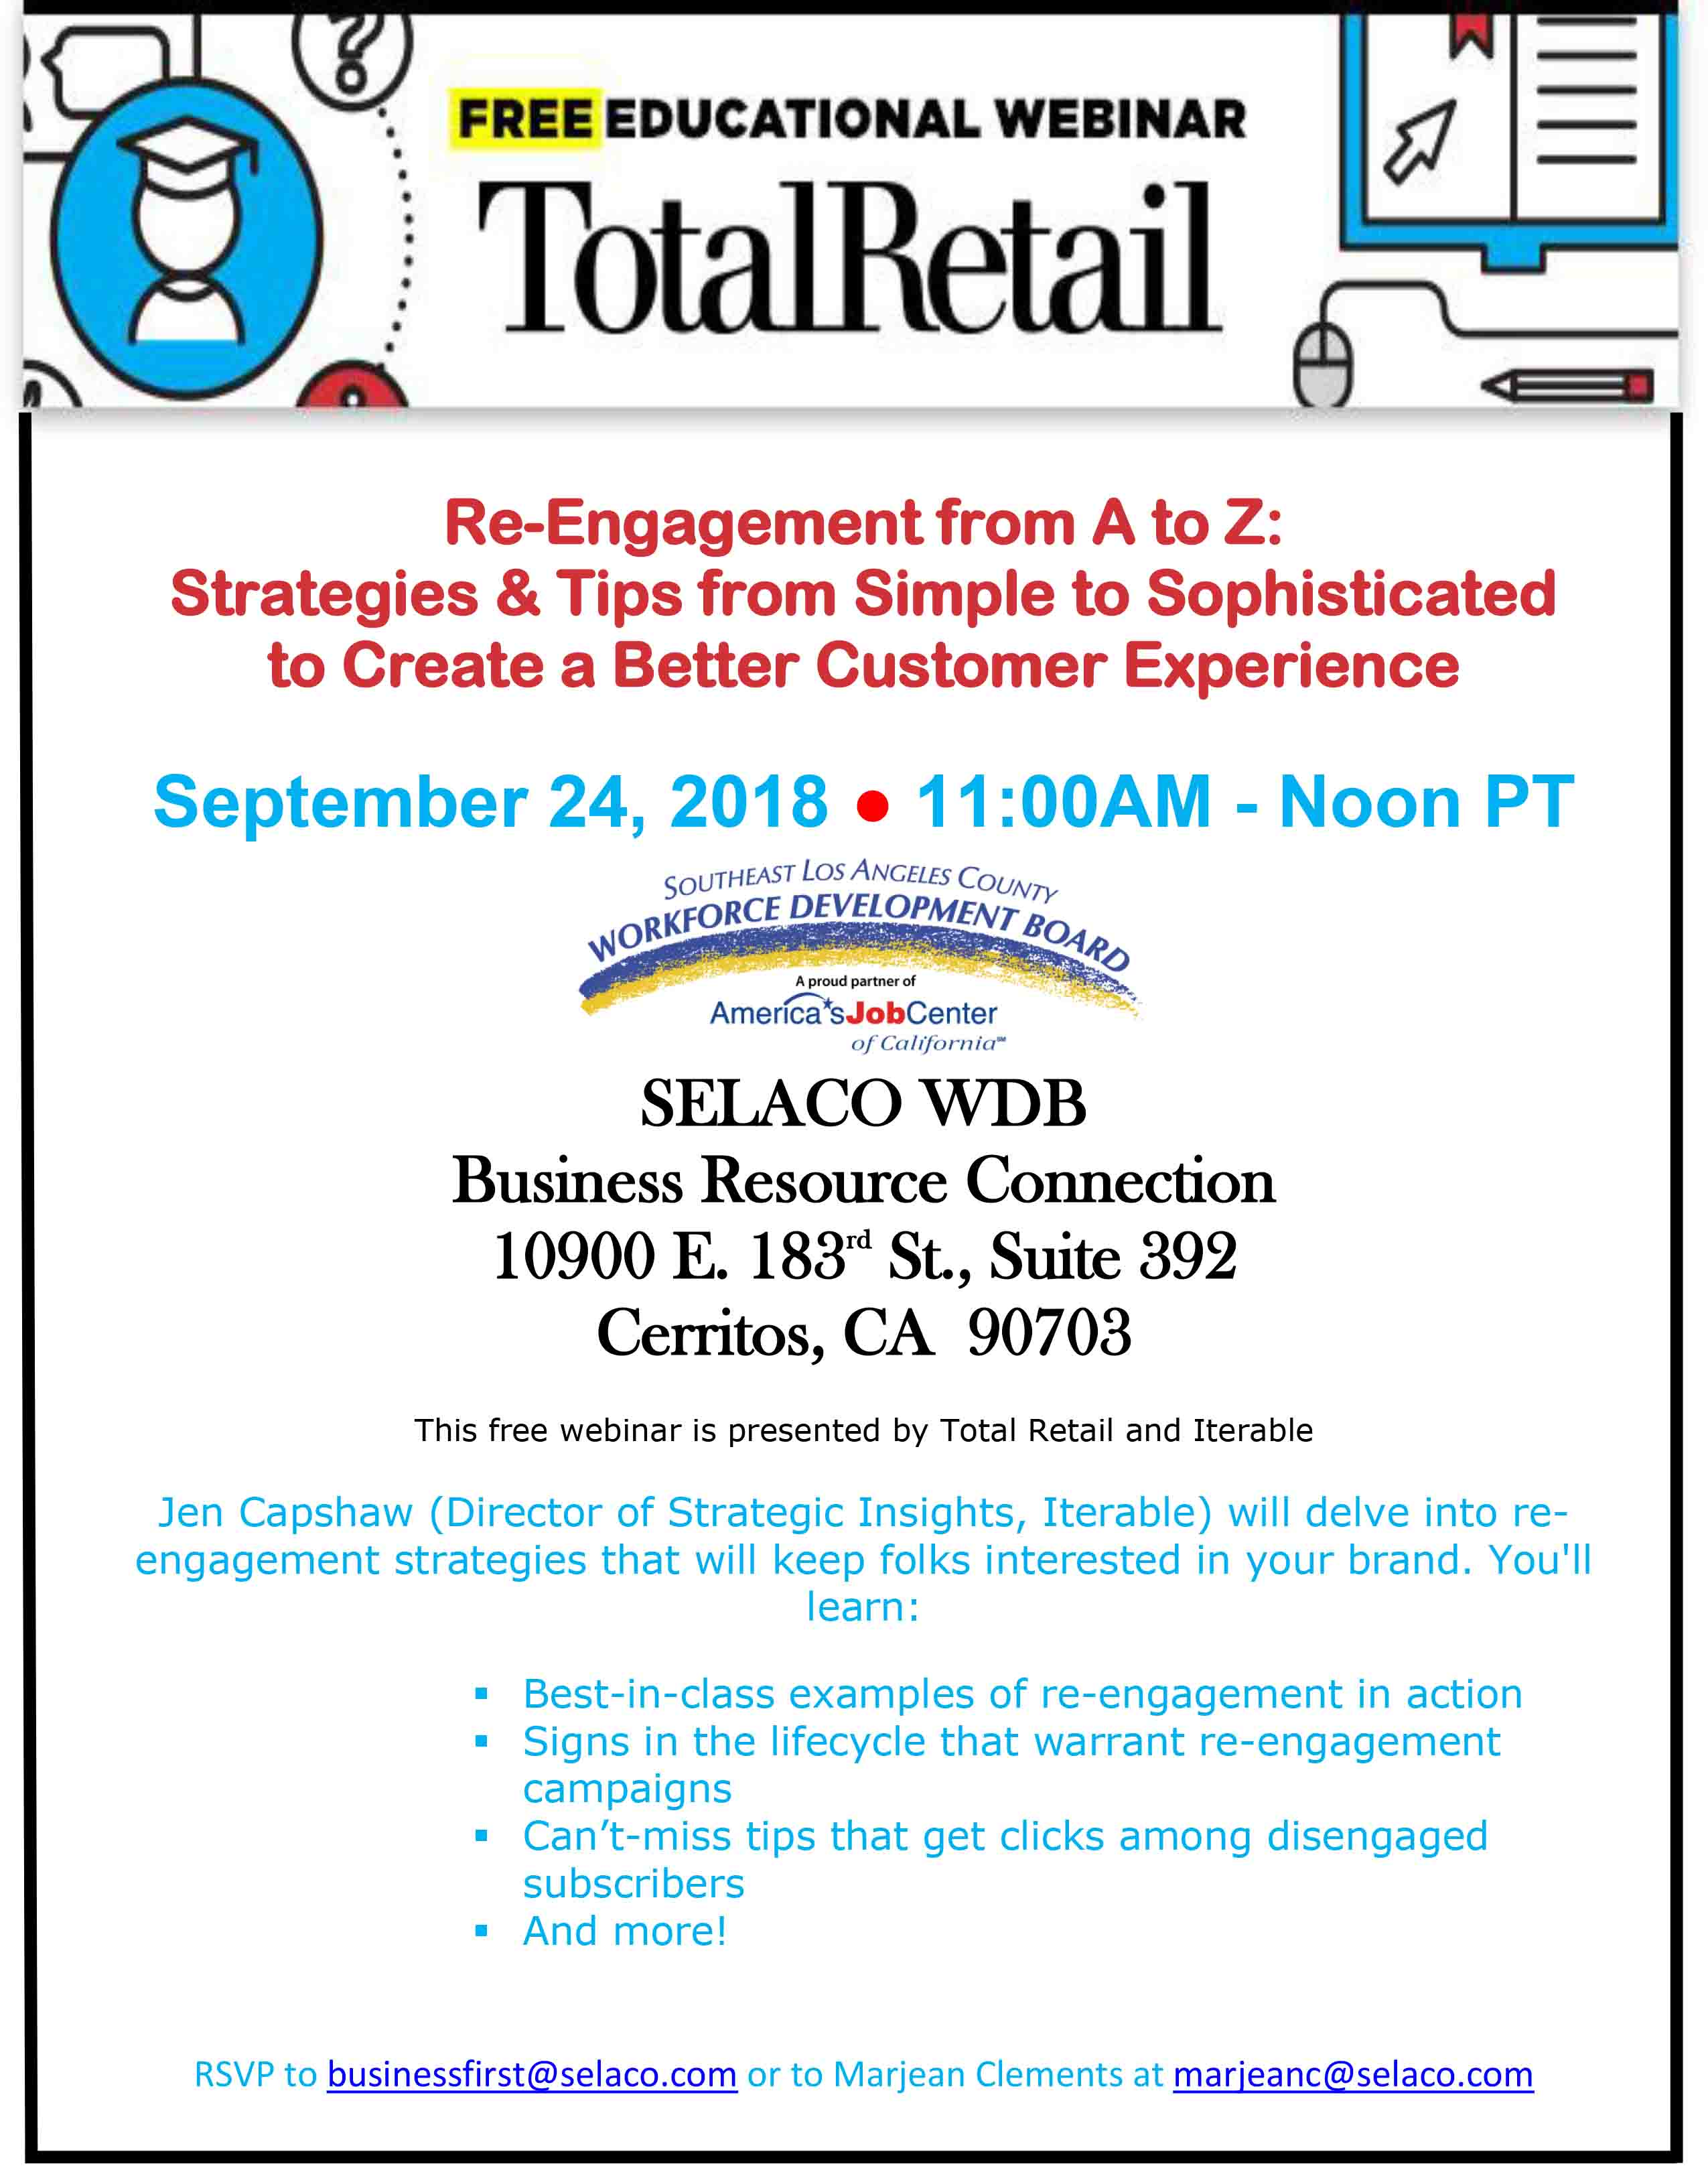 events test selaco wdb